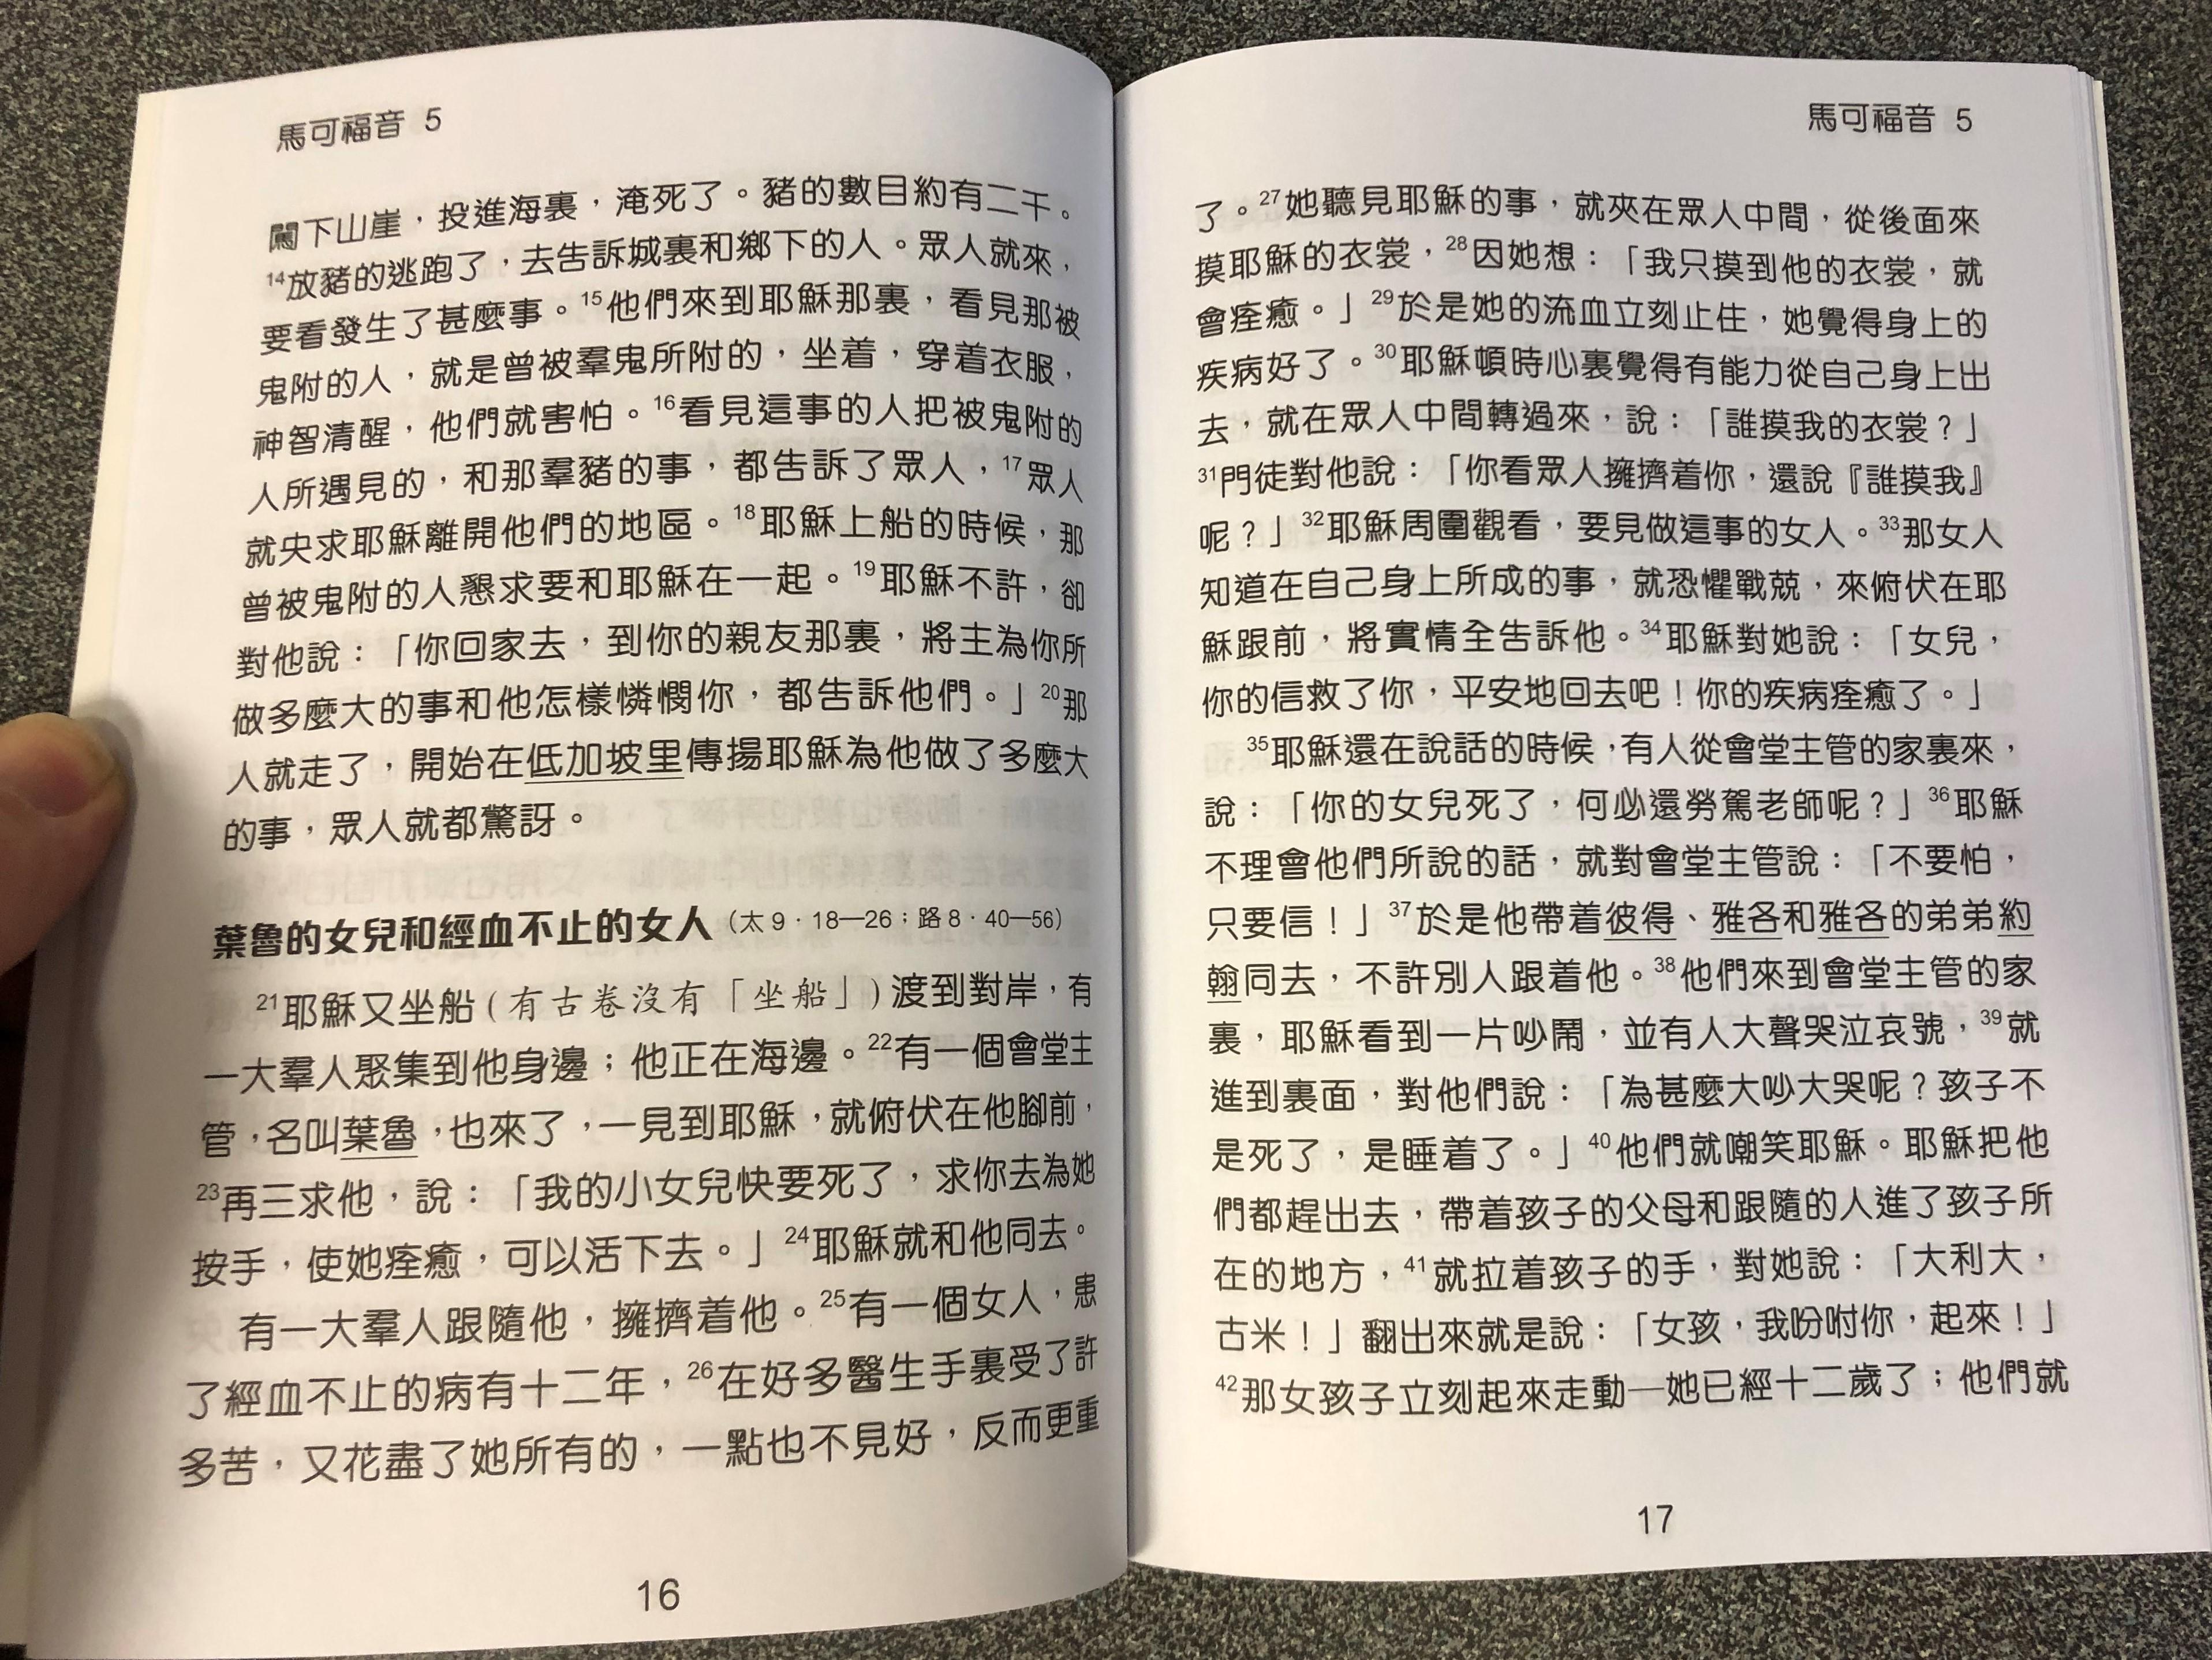 chinese-gospel-of-mark-with-gospel-bridge-super-large-print-3-.jpg